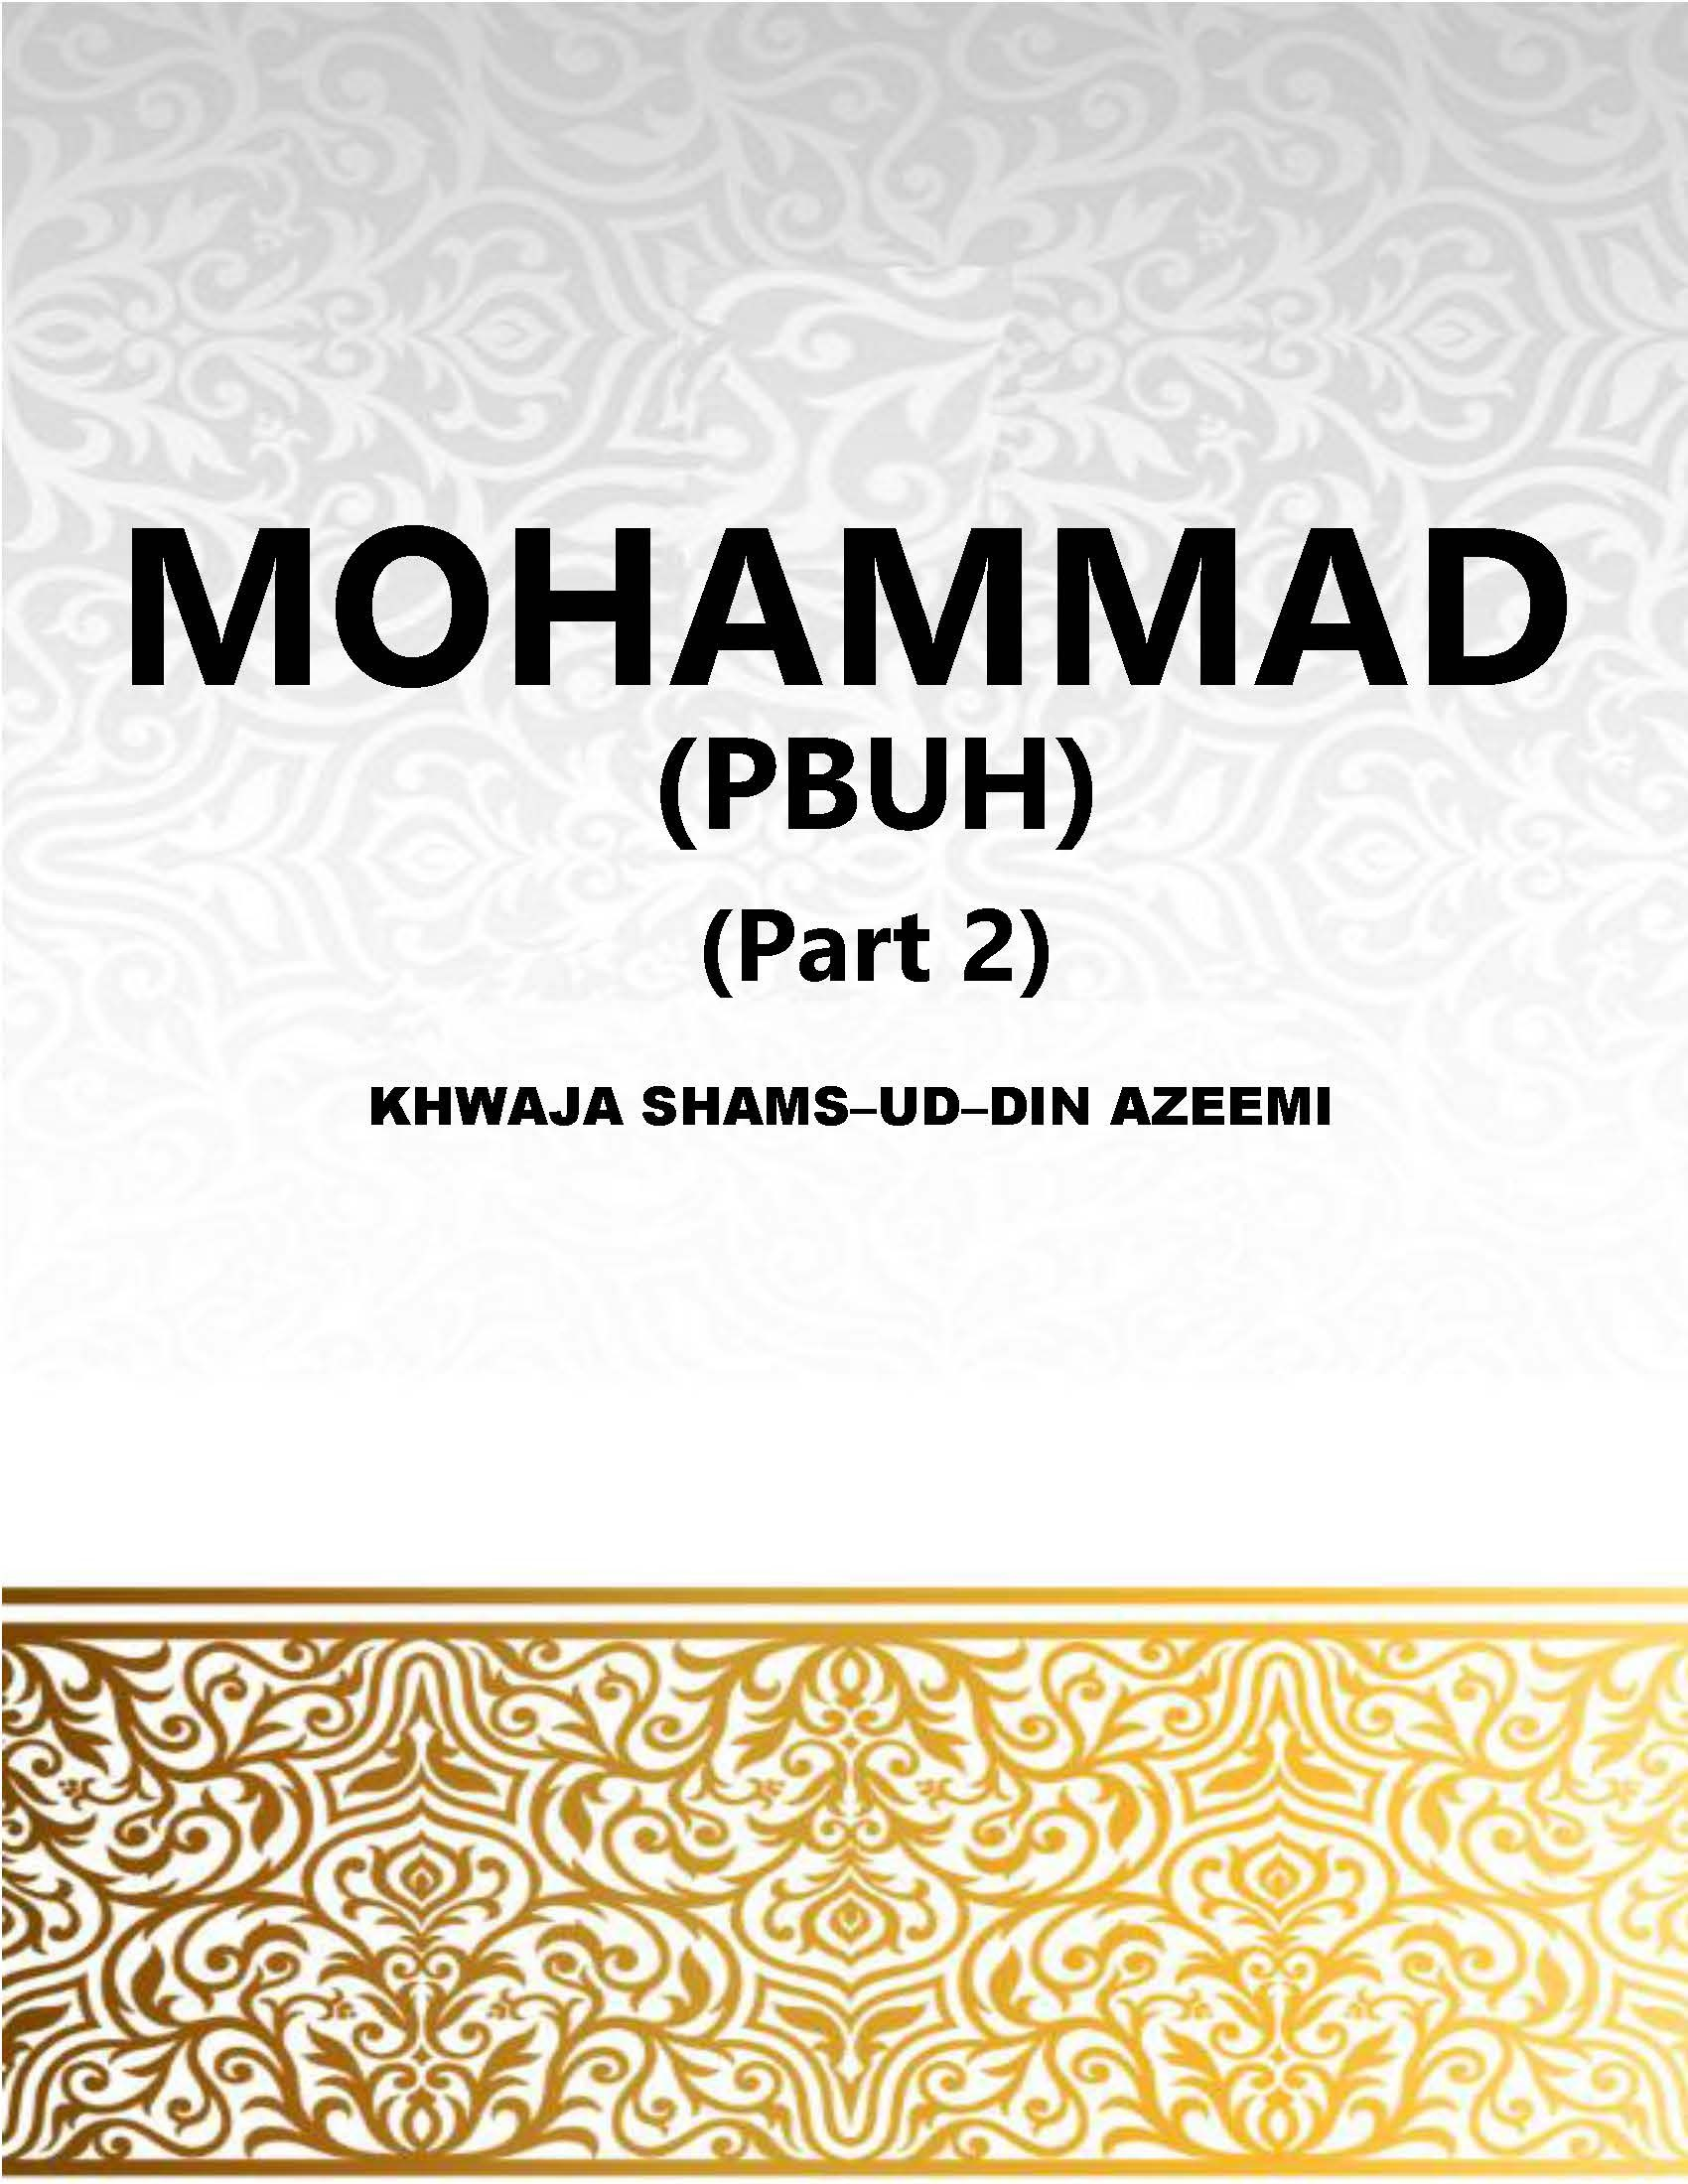 MOHAMMAD (PBUH) The Prophet Of God  Part 2